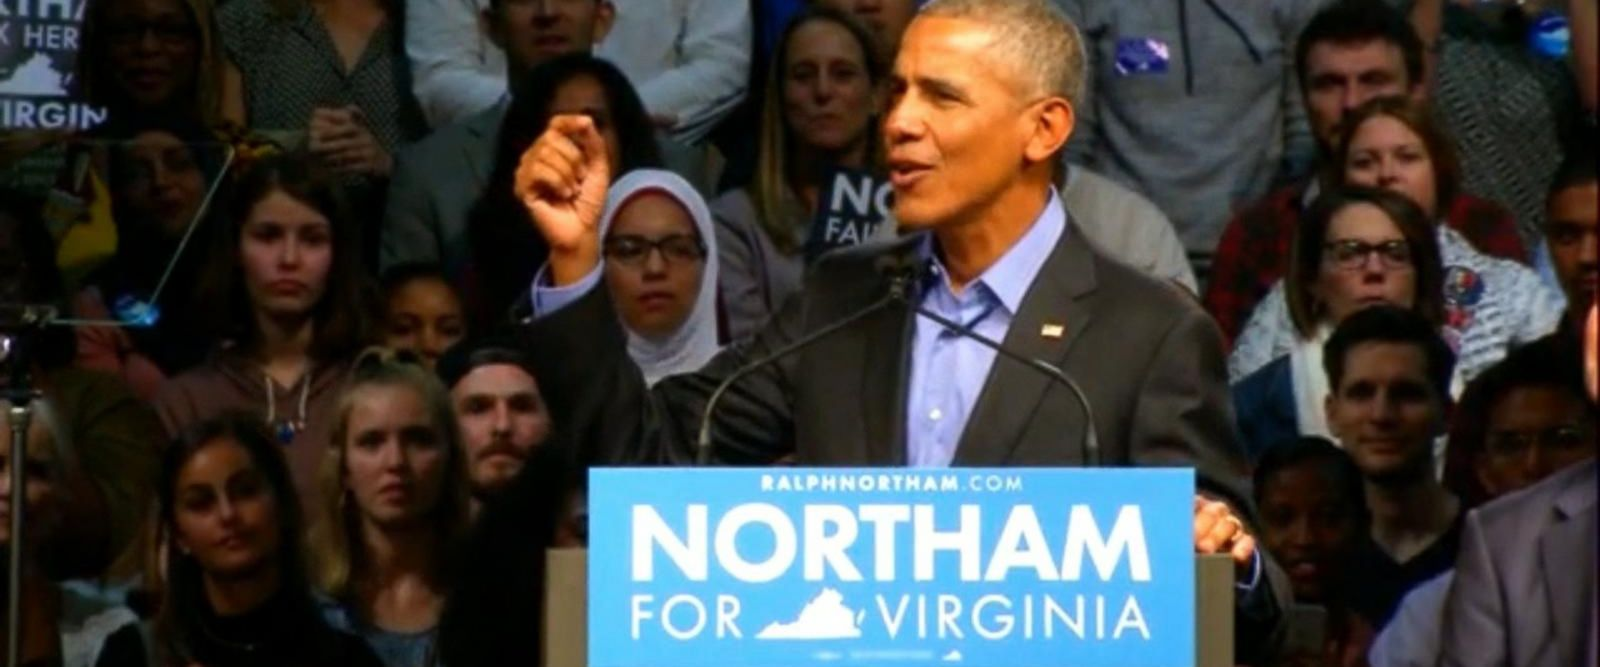 VIDEO: Obama, Bush address divisions in the US under Trump